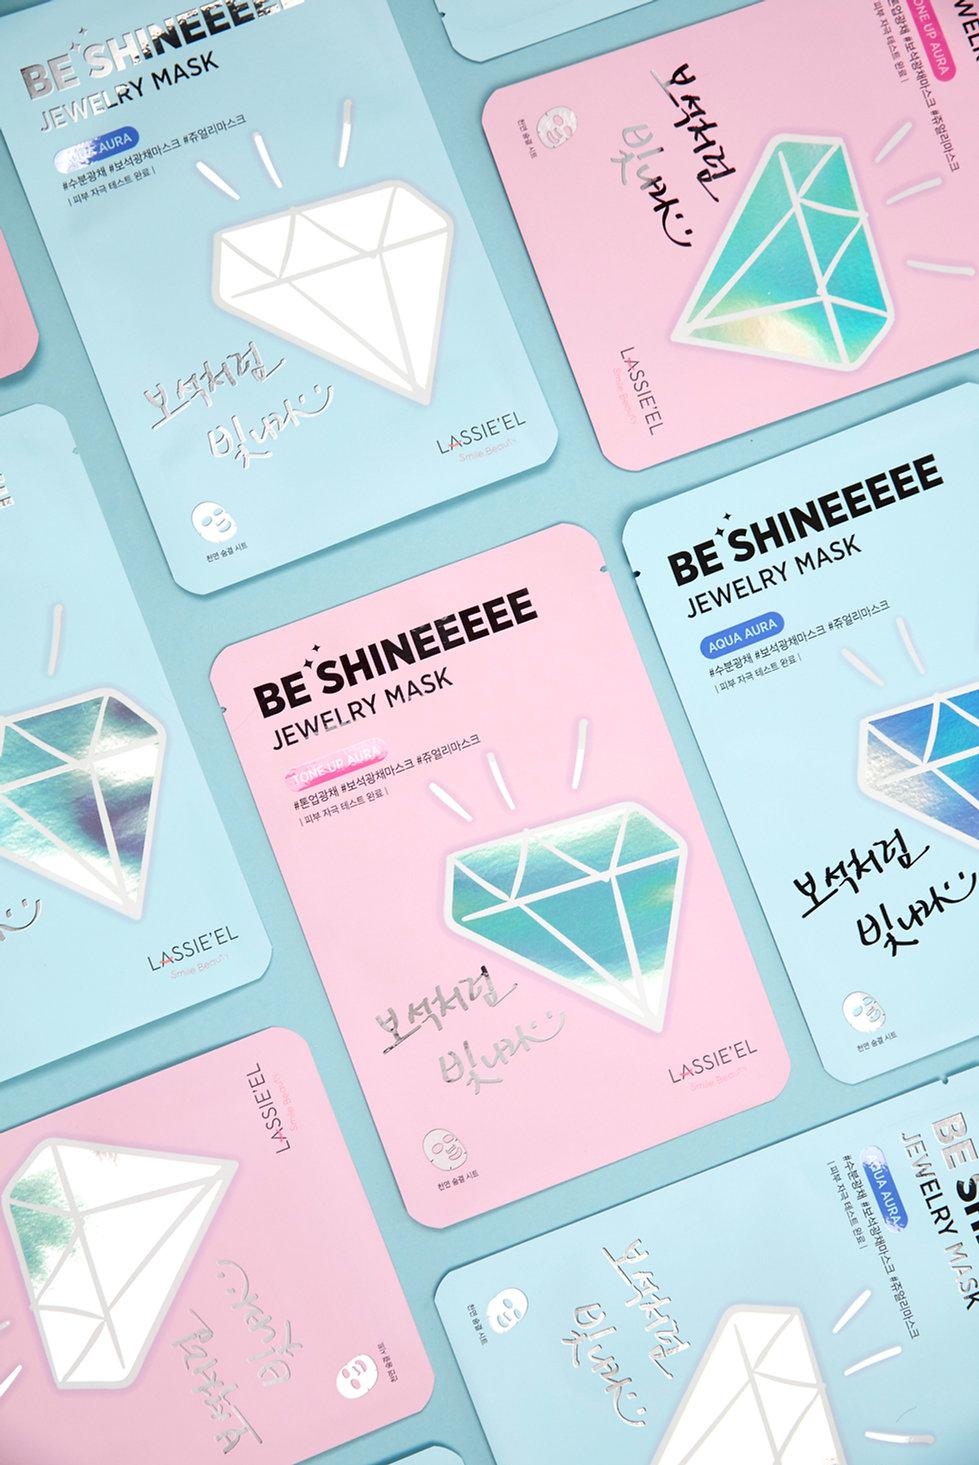 Emptyfull Design 엠티풀디자인 | Lassie'el Be Shine Jewelry Mask 라씨엘르 비 샤인 주얼리 마스크 | BI디자인, 브랜딩디자인, Packaging, 패키징, 패키지디자인 | 디자인외주, 디자인전문회사